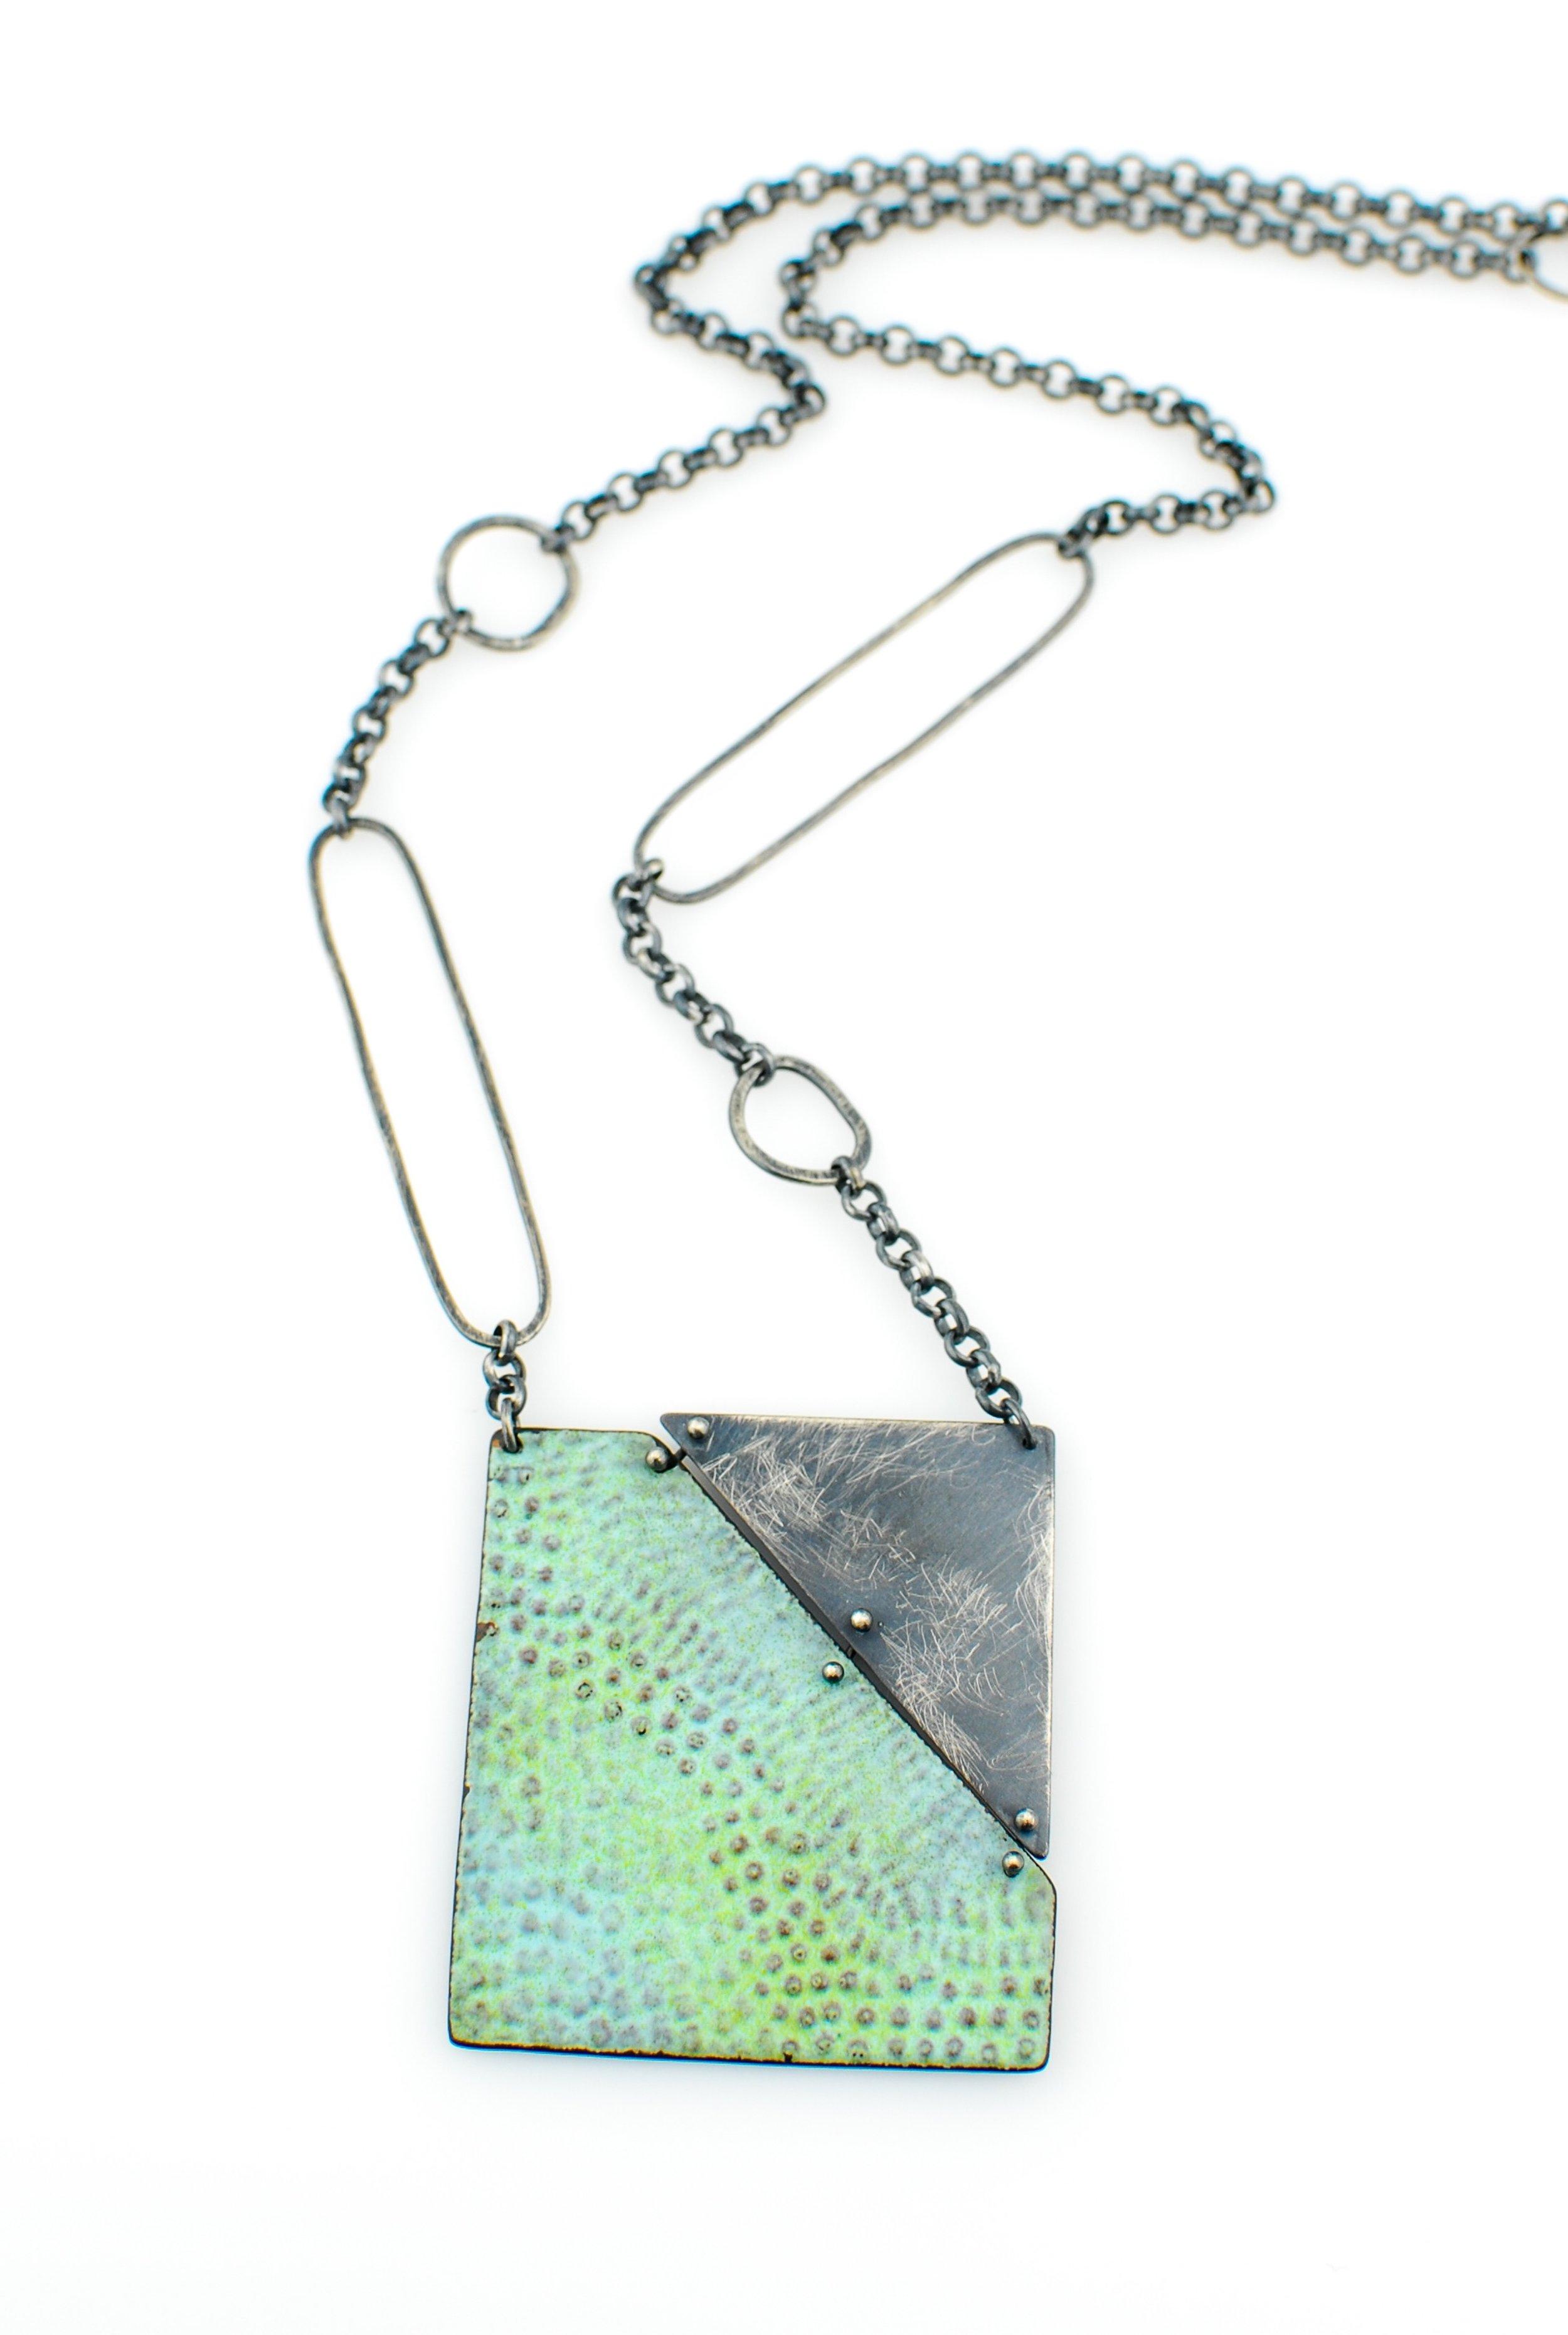 trail necklace1 R.jpg